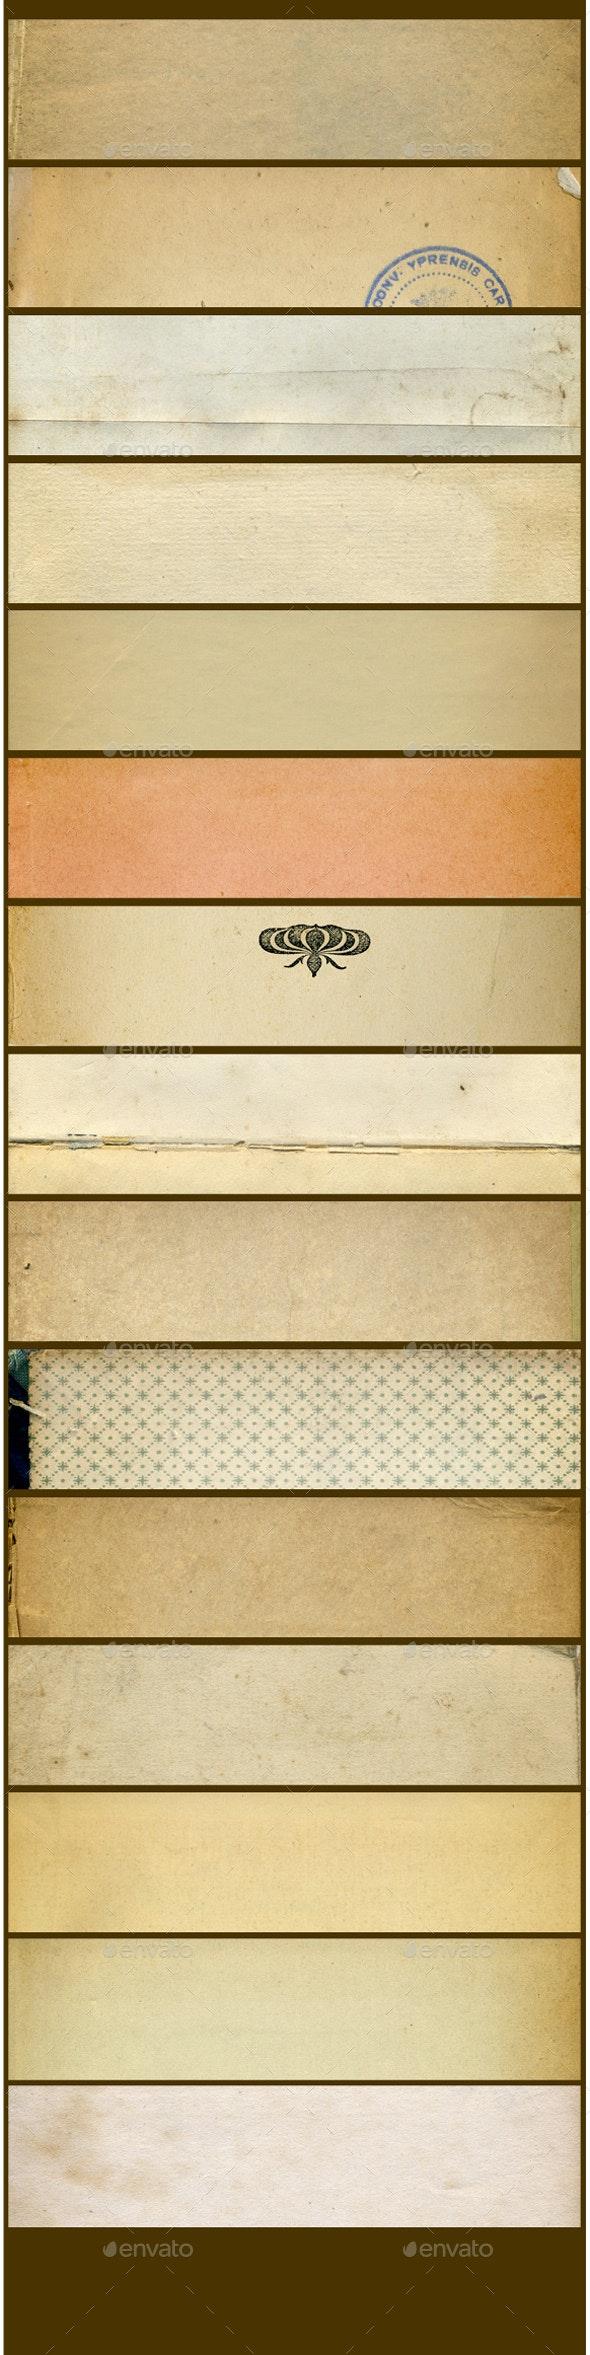 Antique paper textures pack - Paper Textures